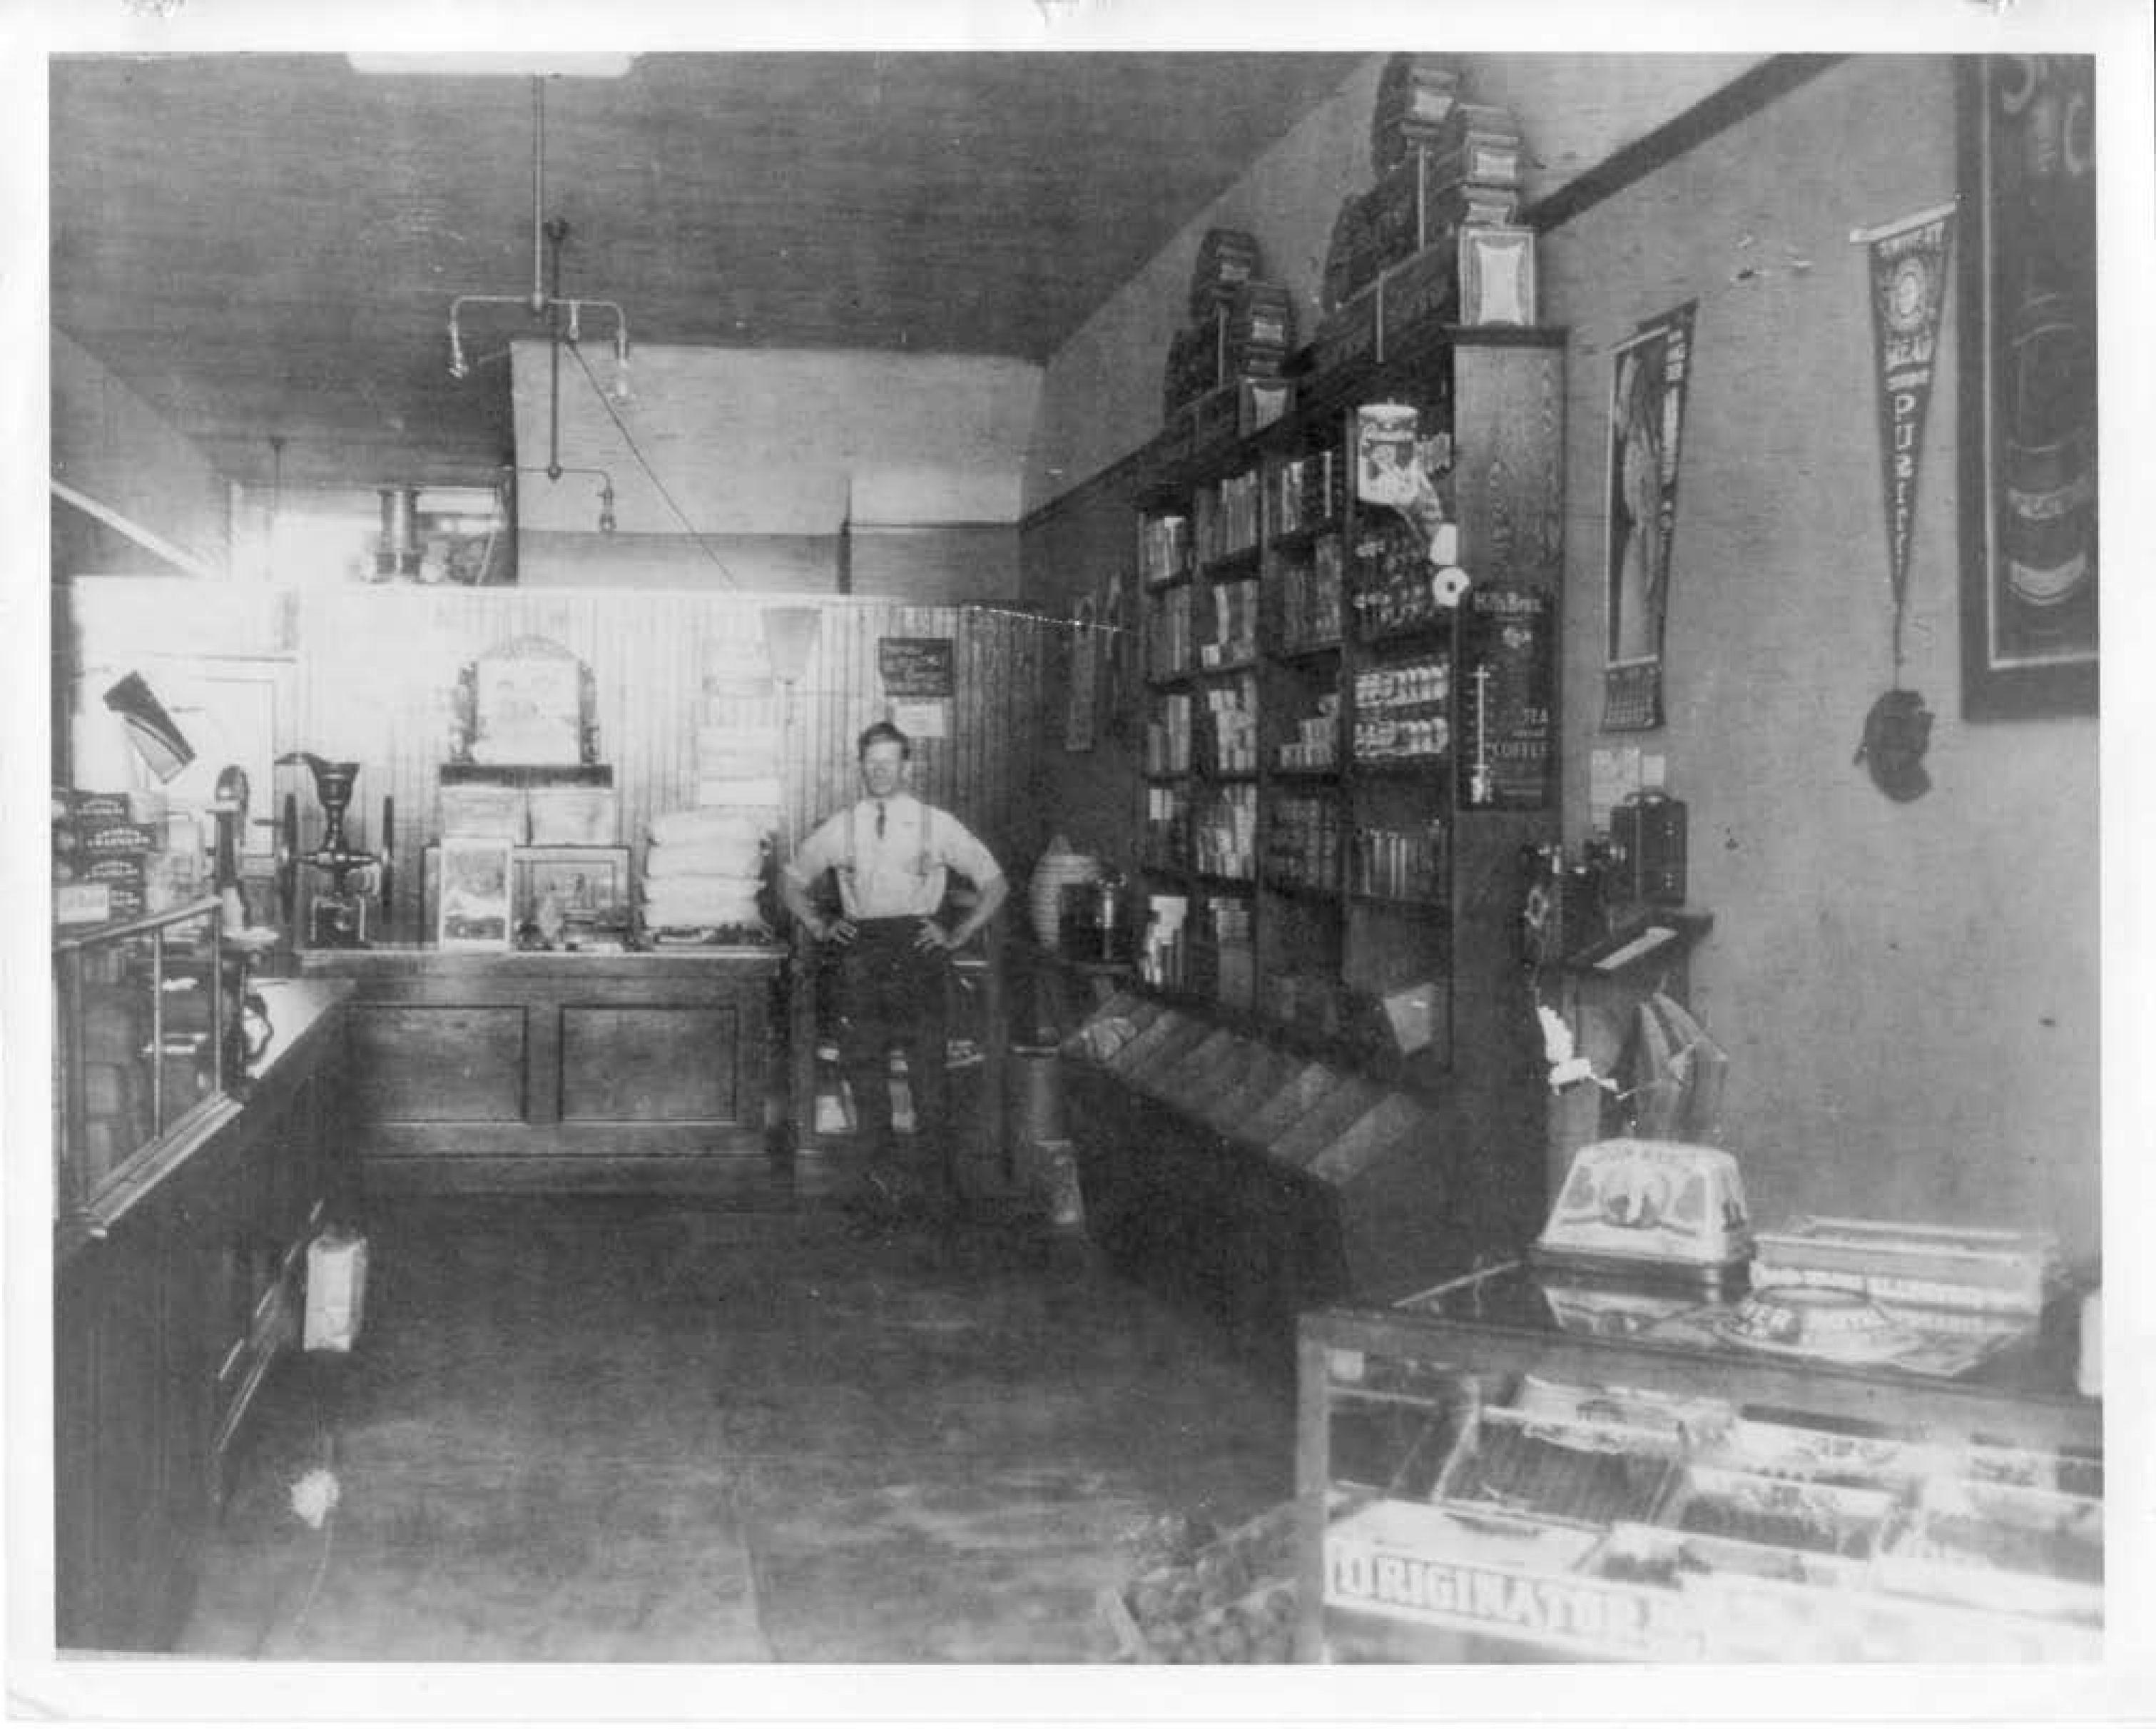 Inside A General Store On Main Street In Huntington Beach Circa